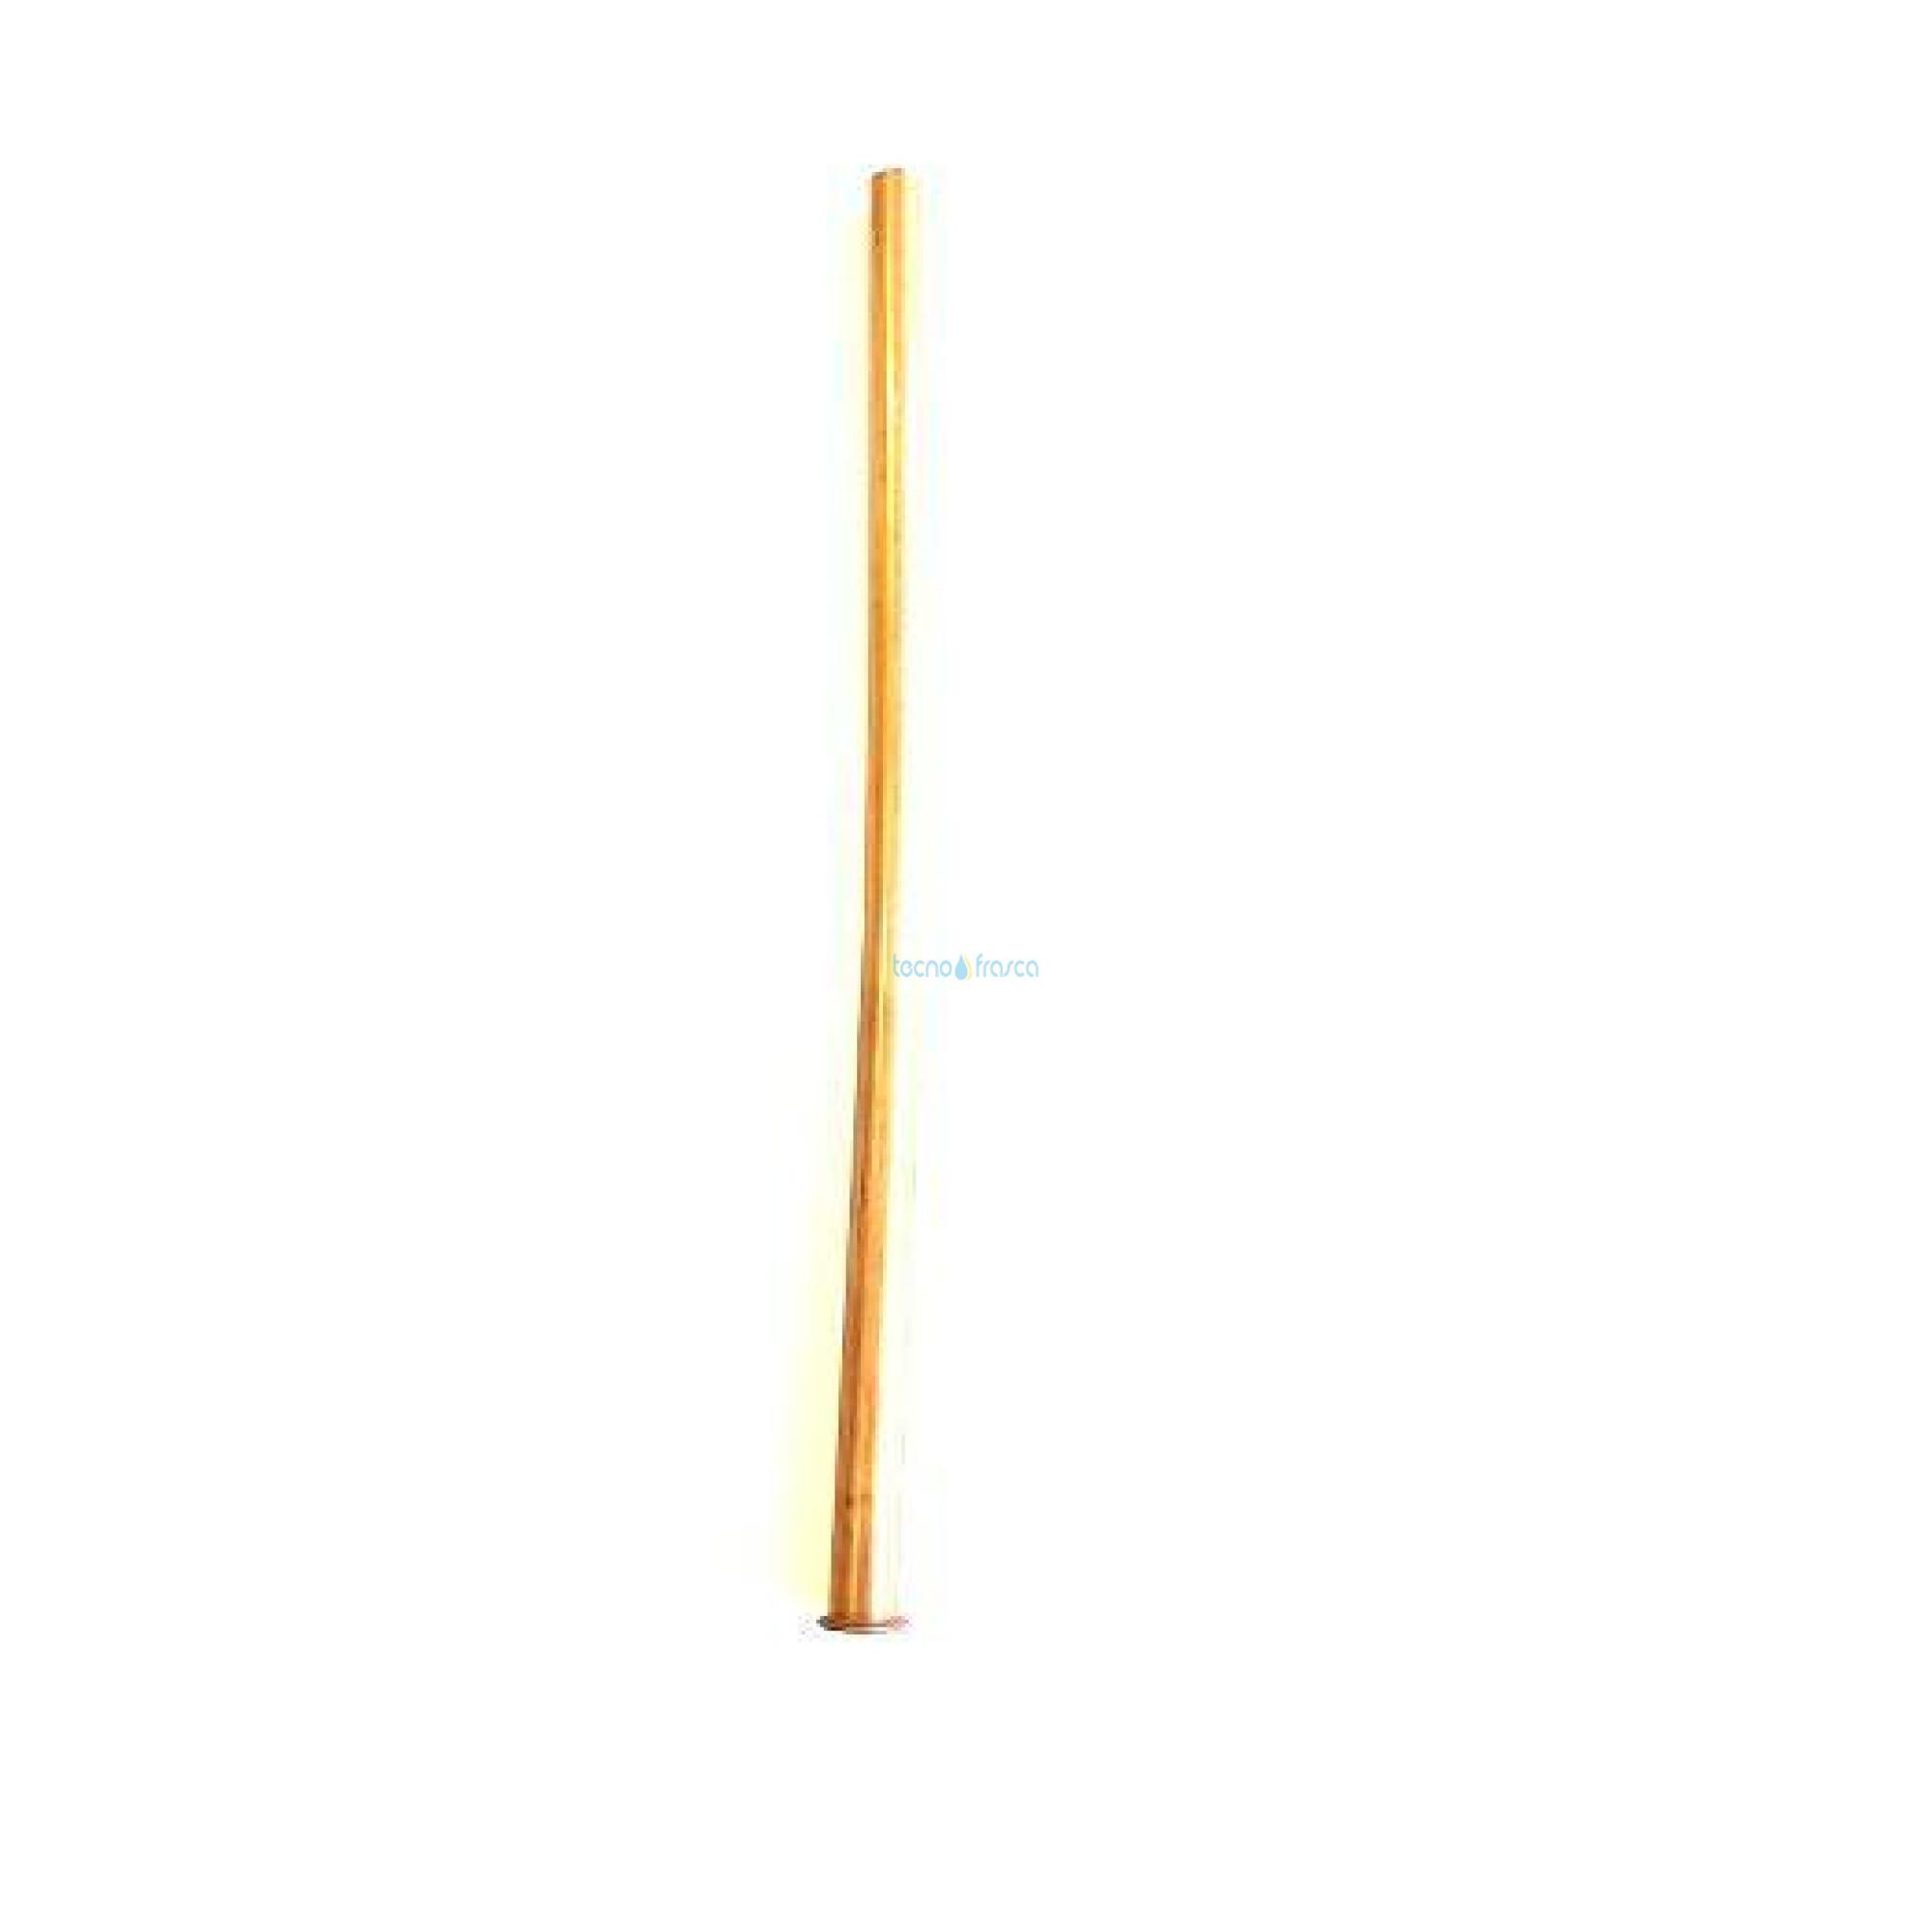 Ariston tubo 3/4 l430 65104539